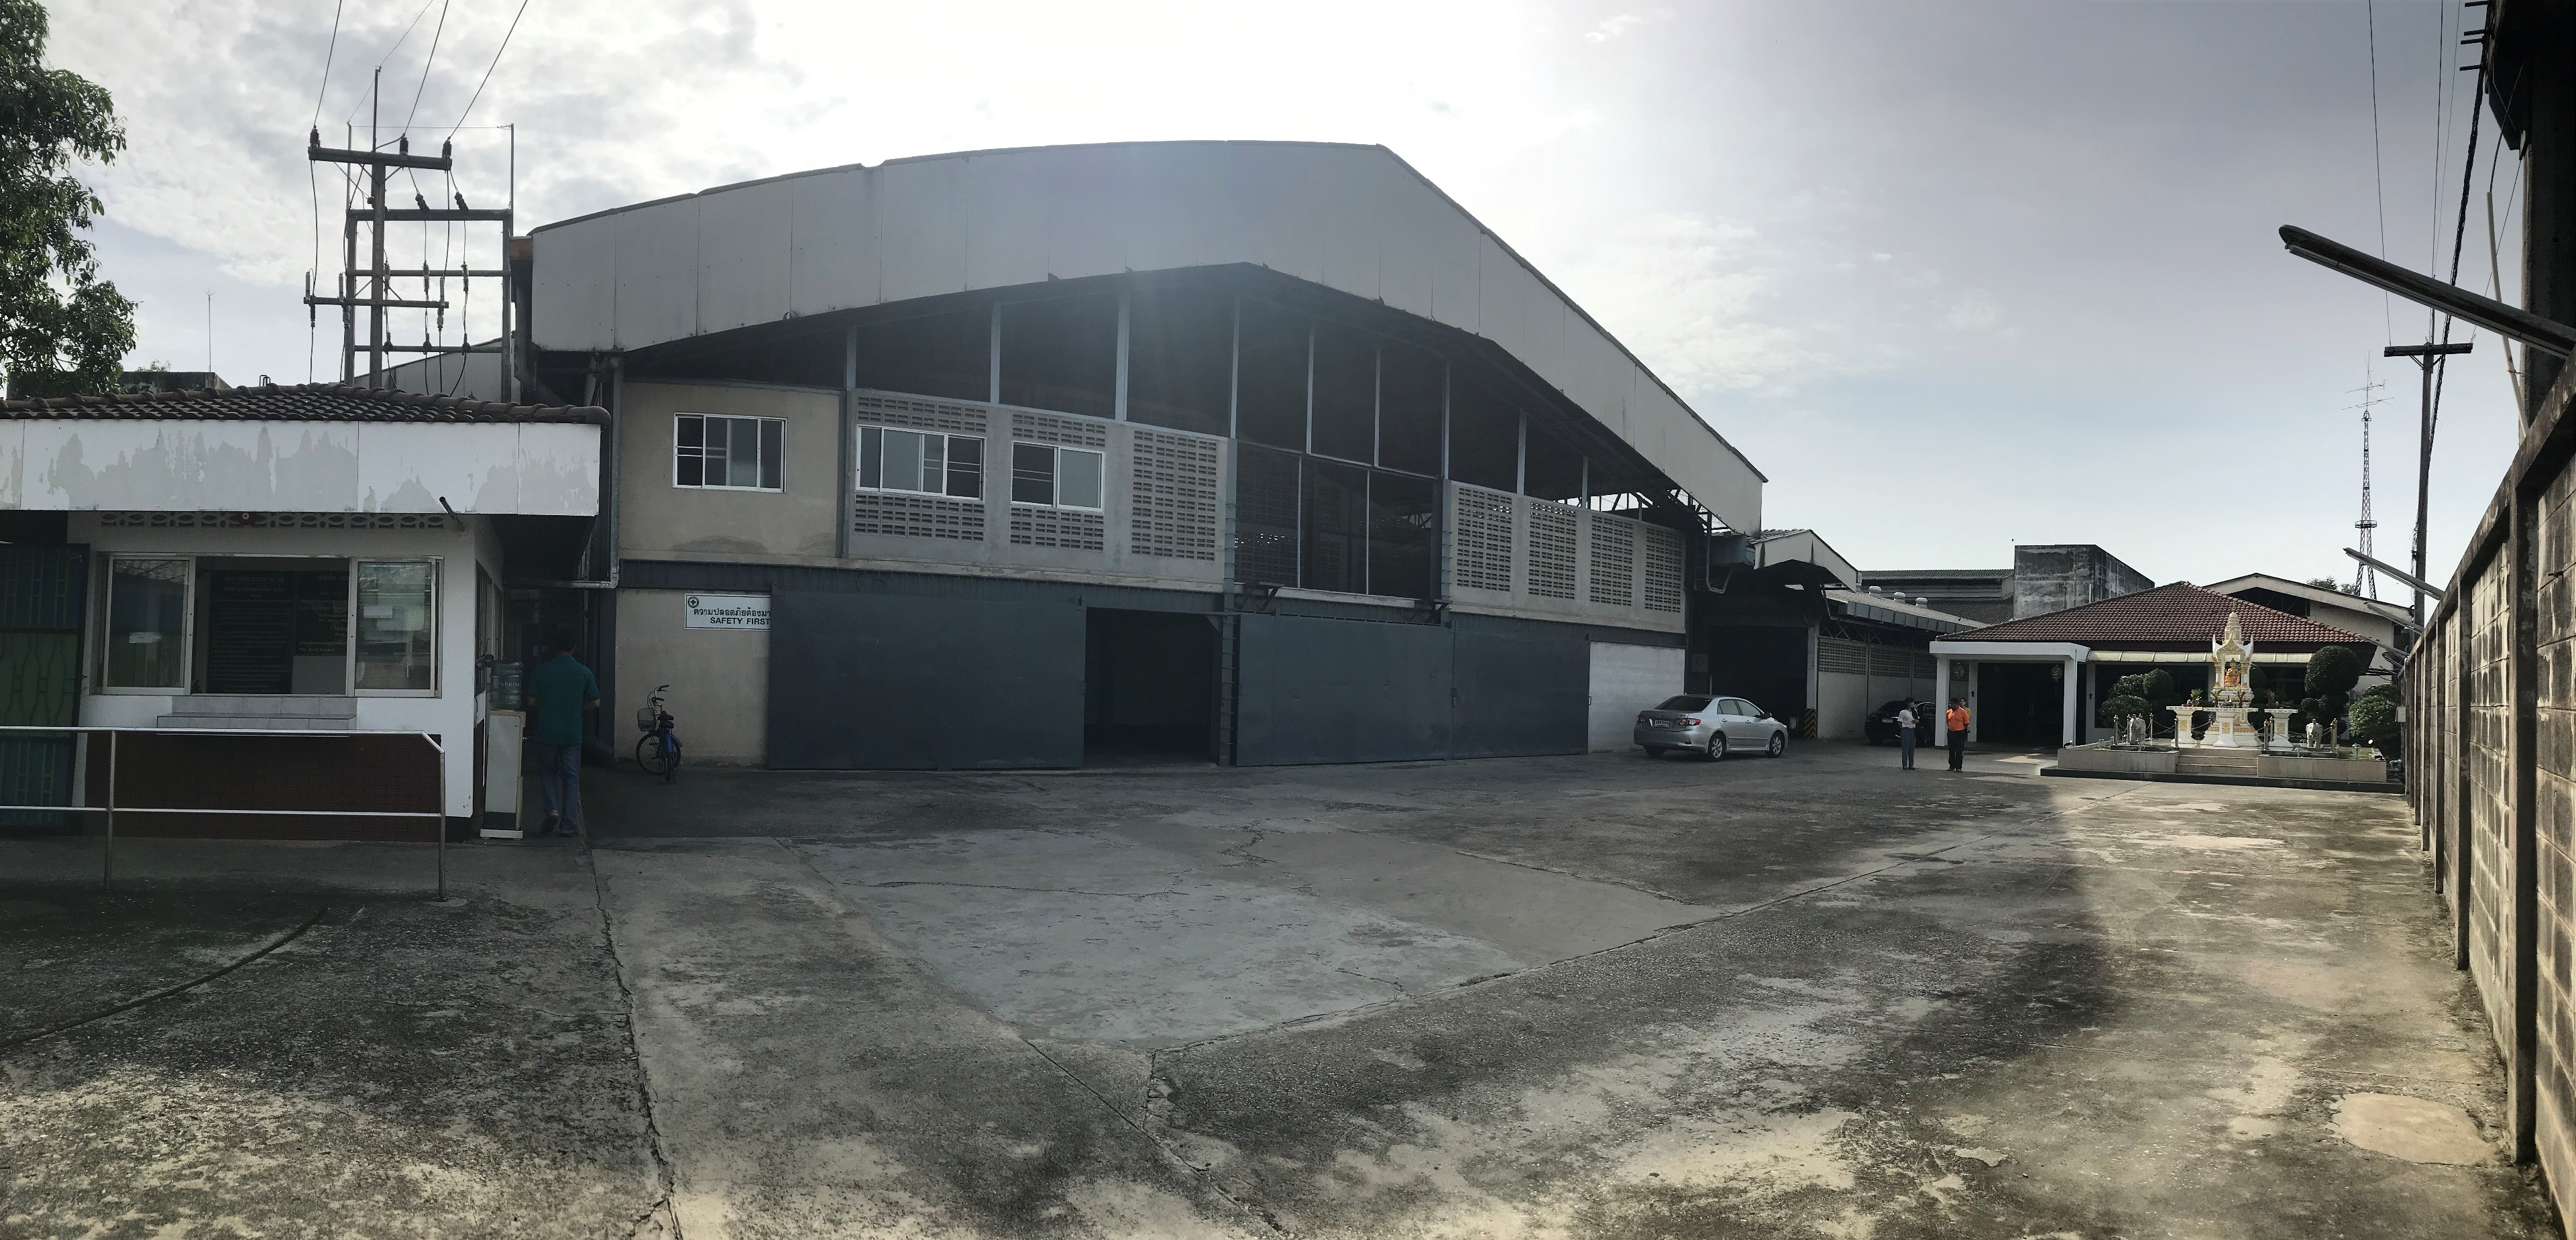 Factory for sale ที่ตำบลหนองซ้ำซาก อำเภอบ้านบึง จังหวัดชลบุรี